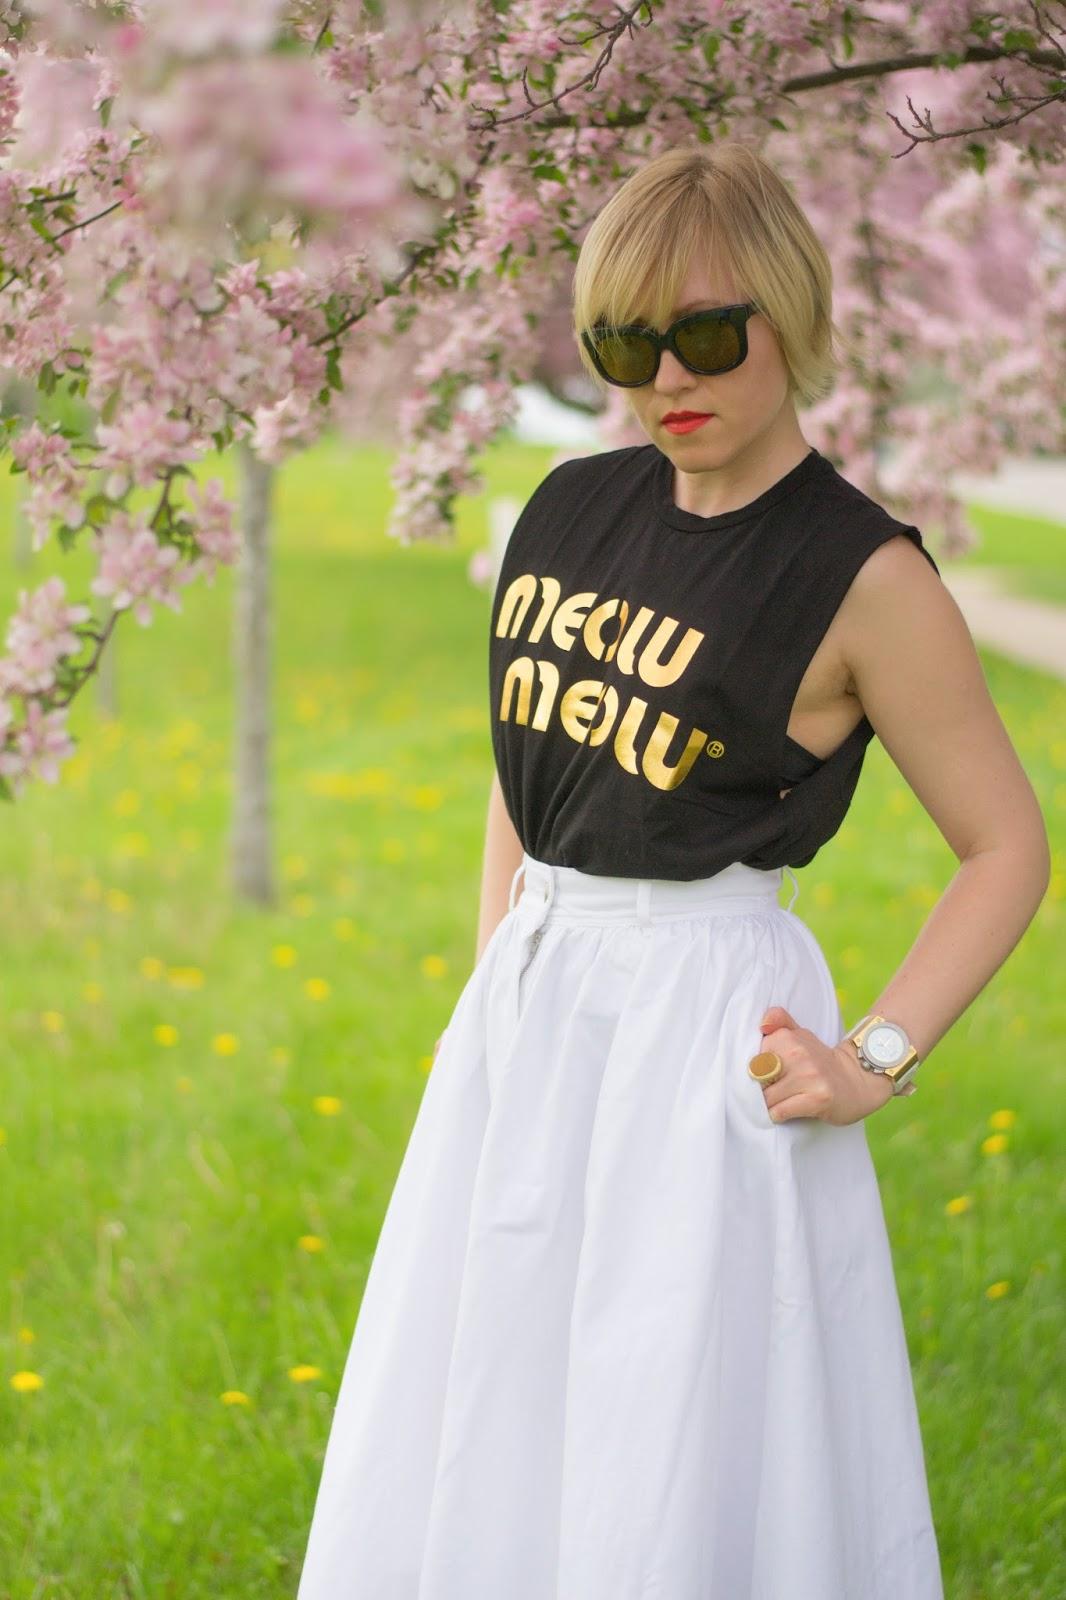 meow meow shirt